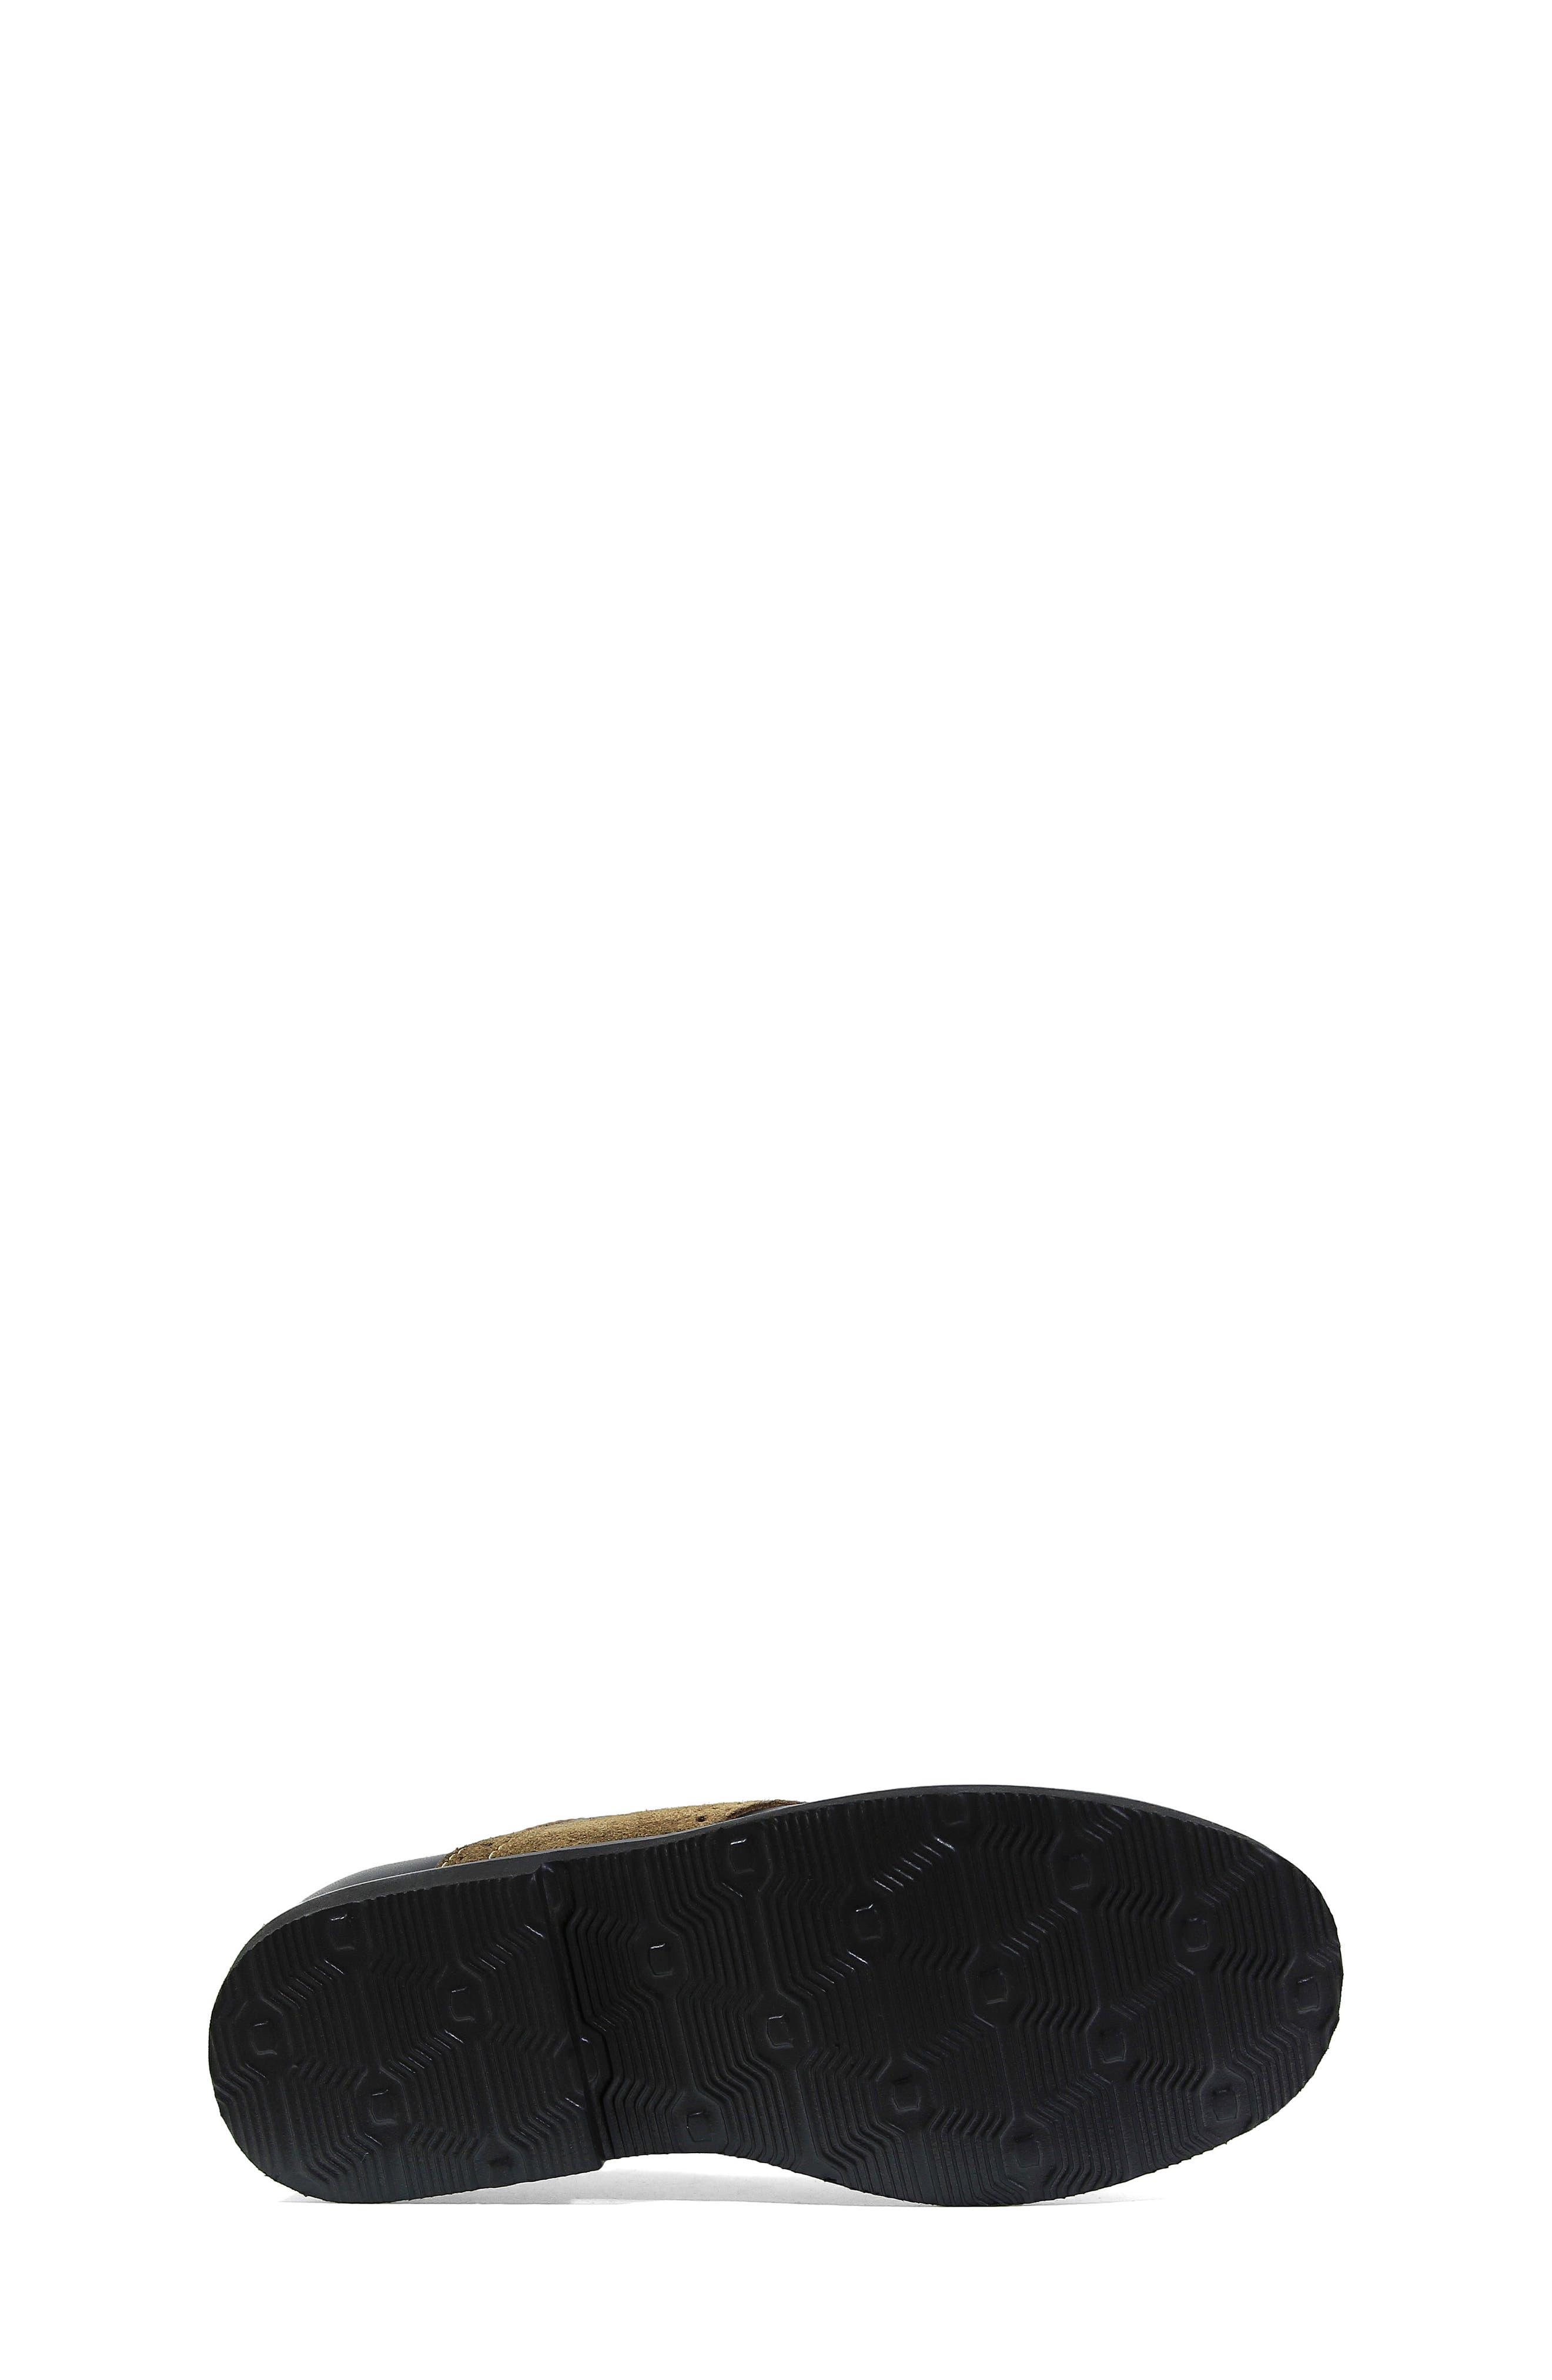 FLORSHEIM, 'Kennett Jr. II' Saddle Shoe, Alternate thumbnail 5, color, SMOOTH BLACK W/ MOCHA SUEDE